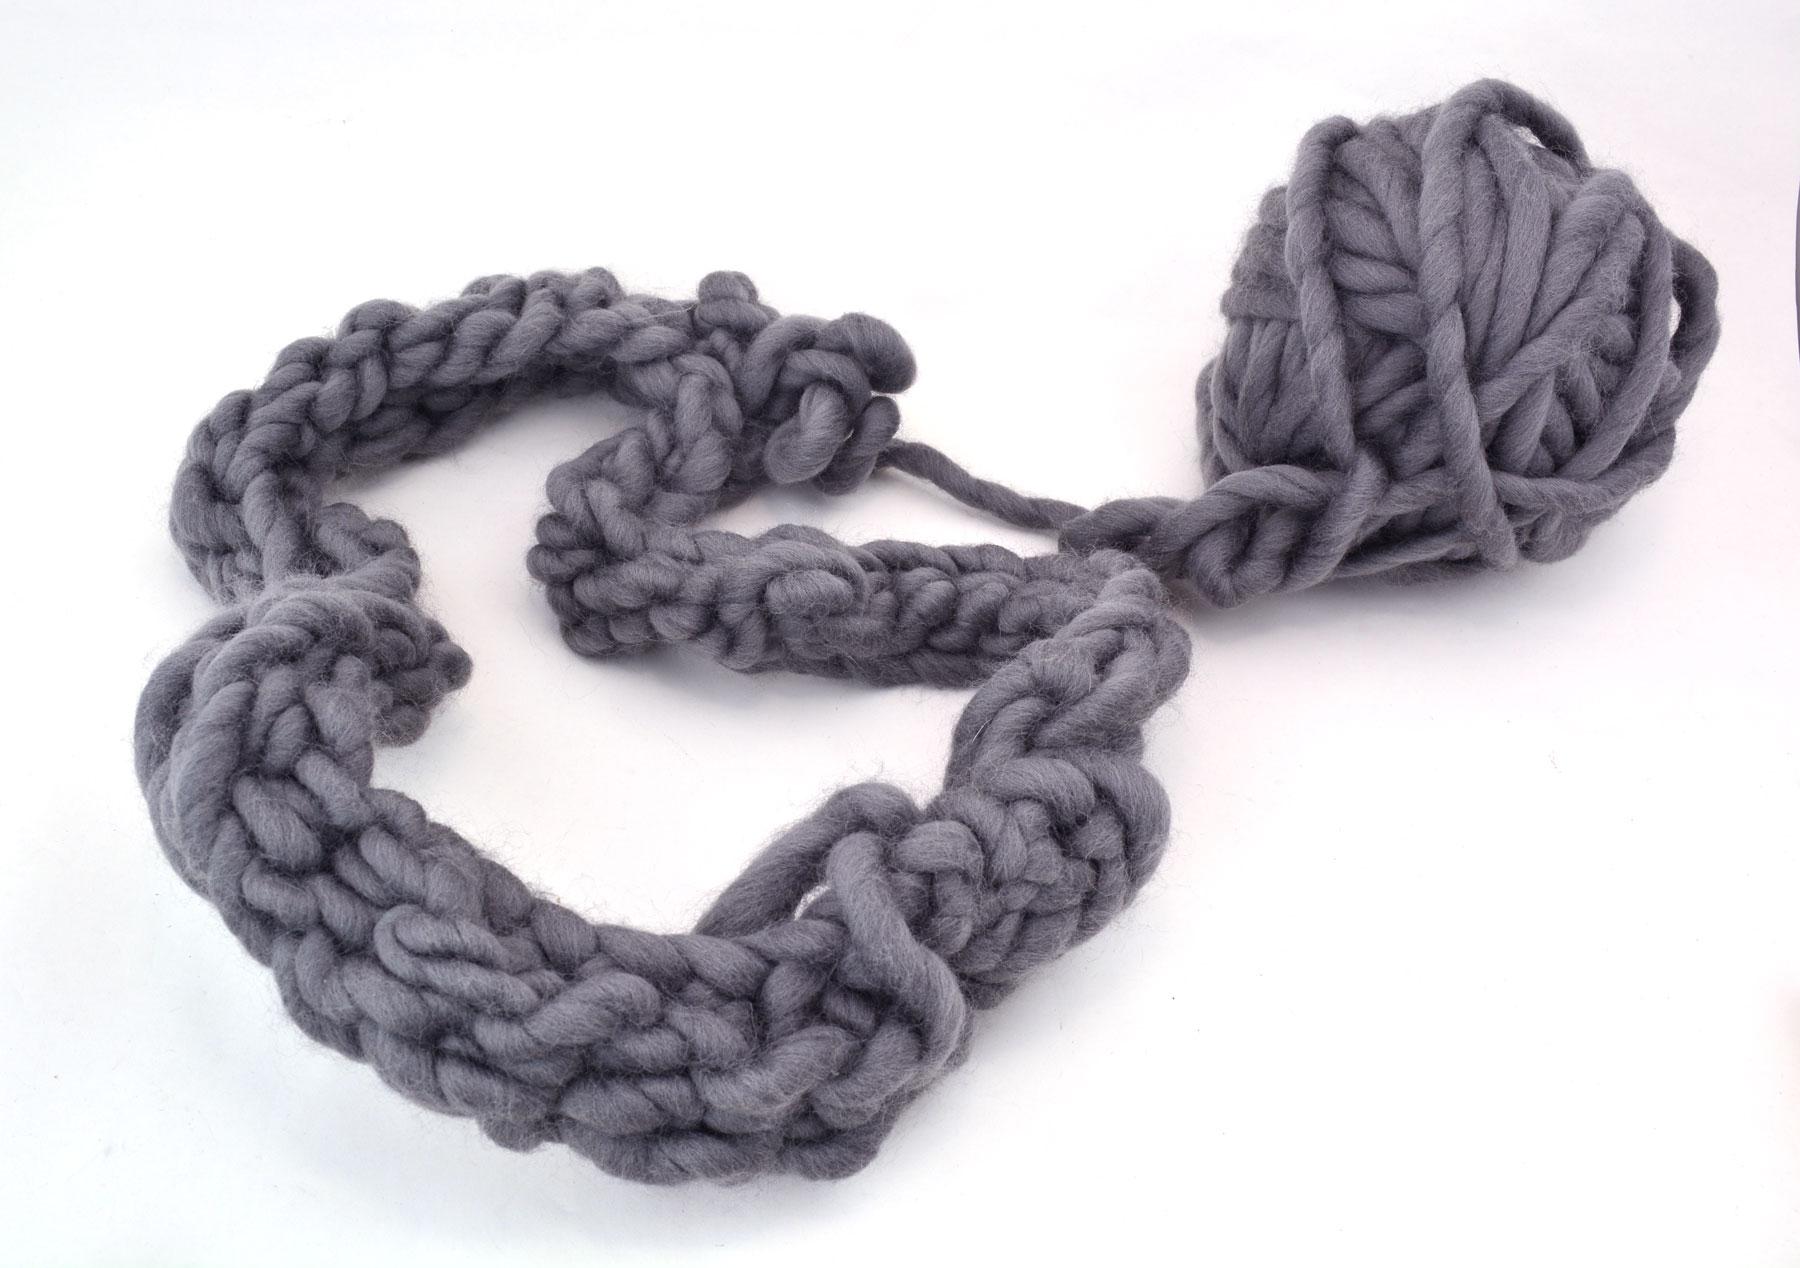 crochet fail - chunky grey yarn in a tight mess